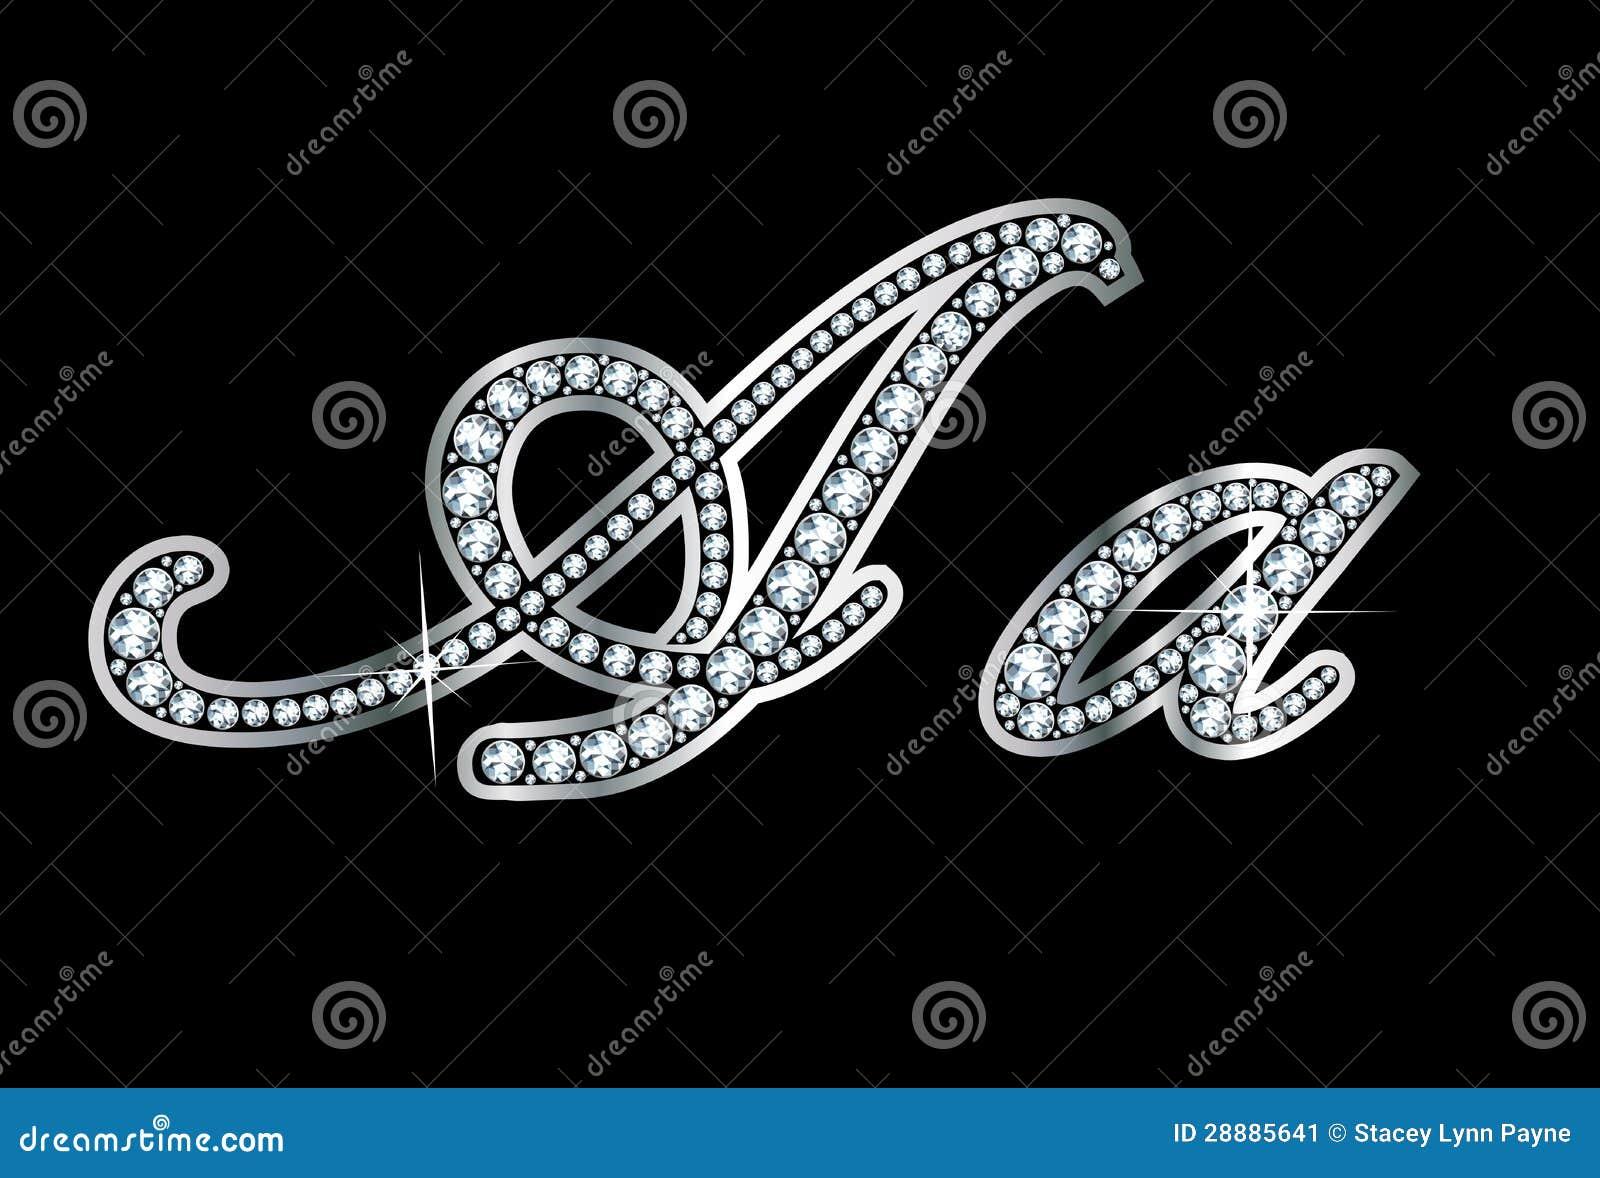 script diamond bling aa letters stock image